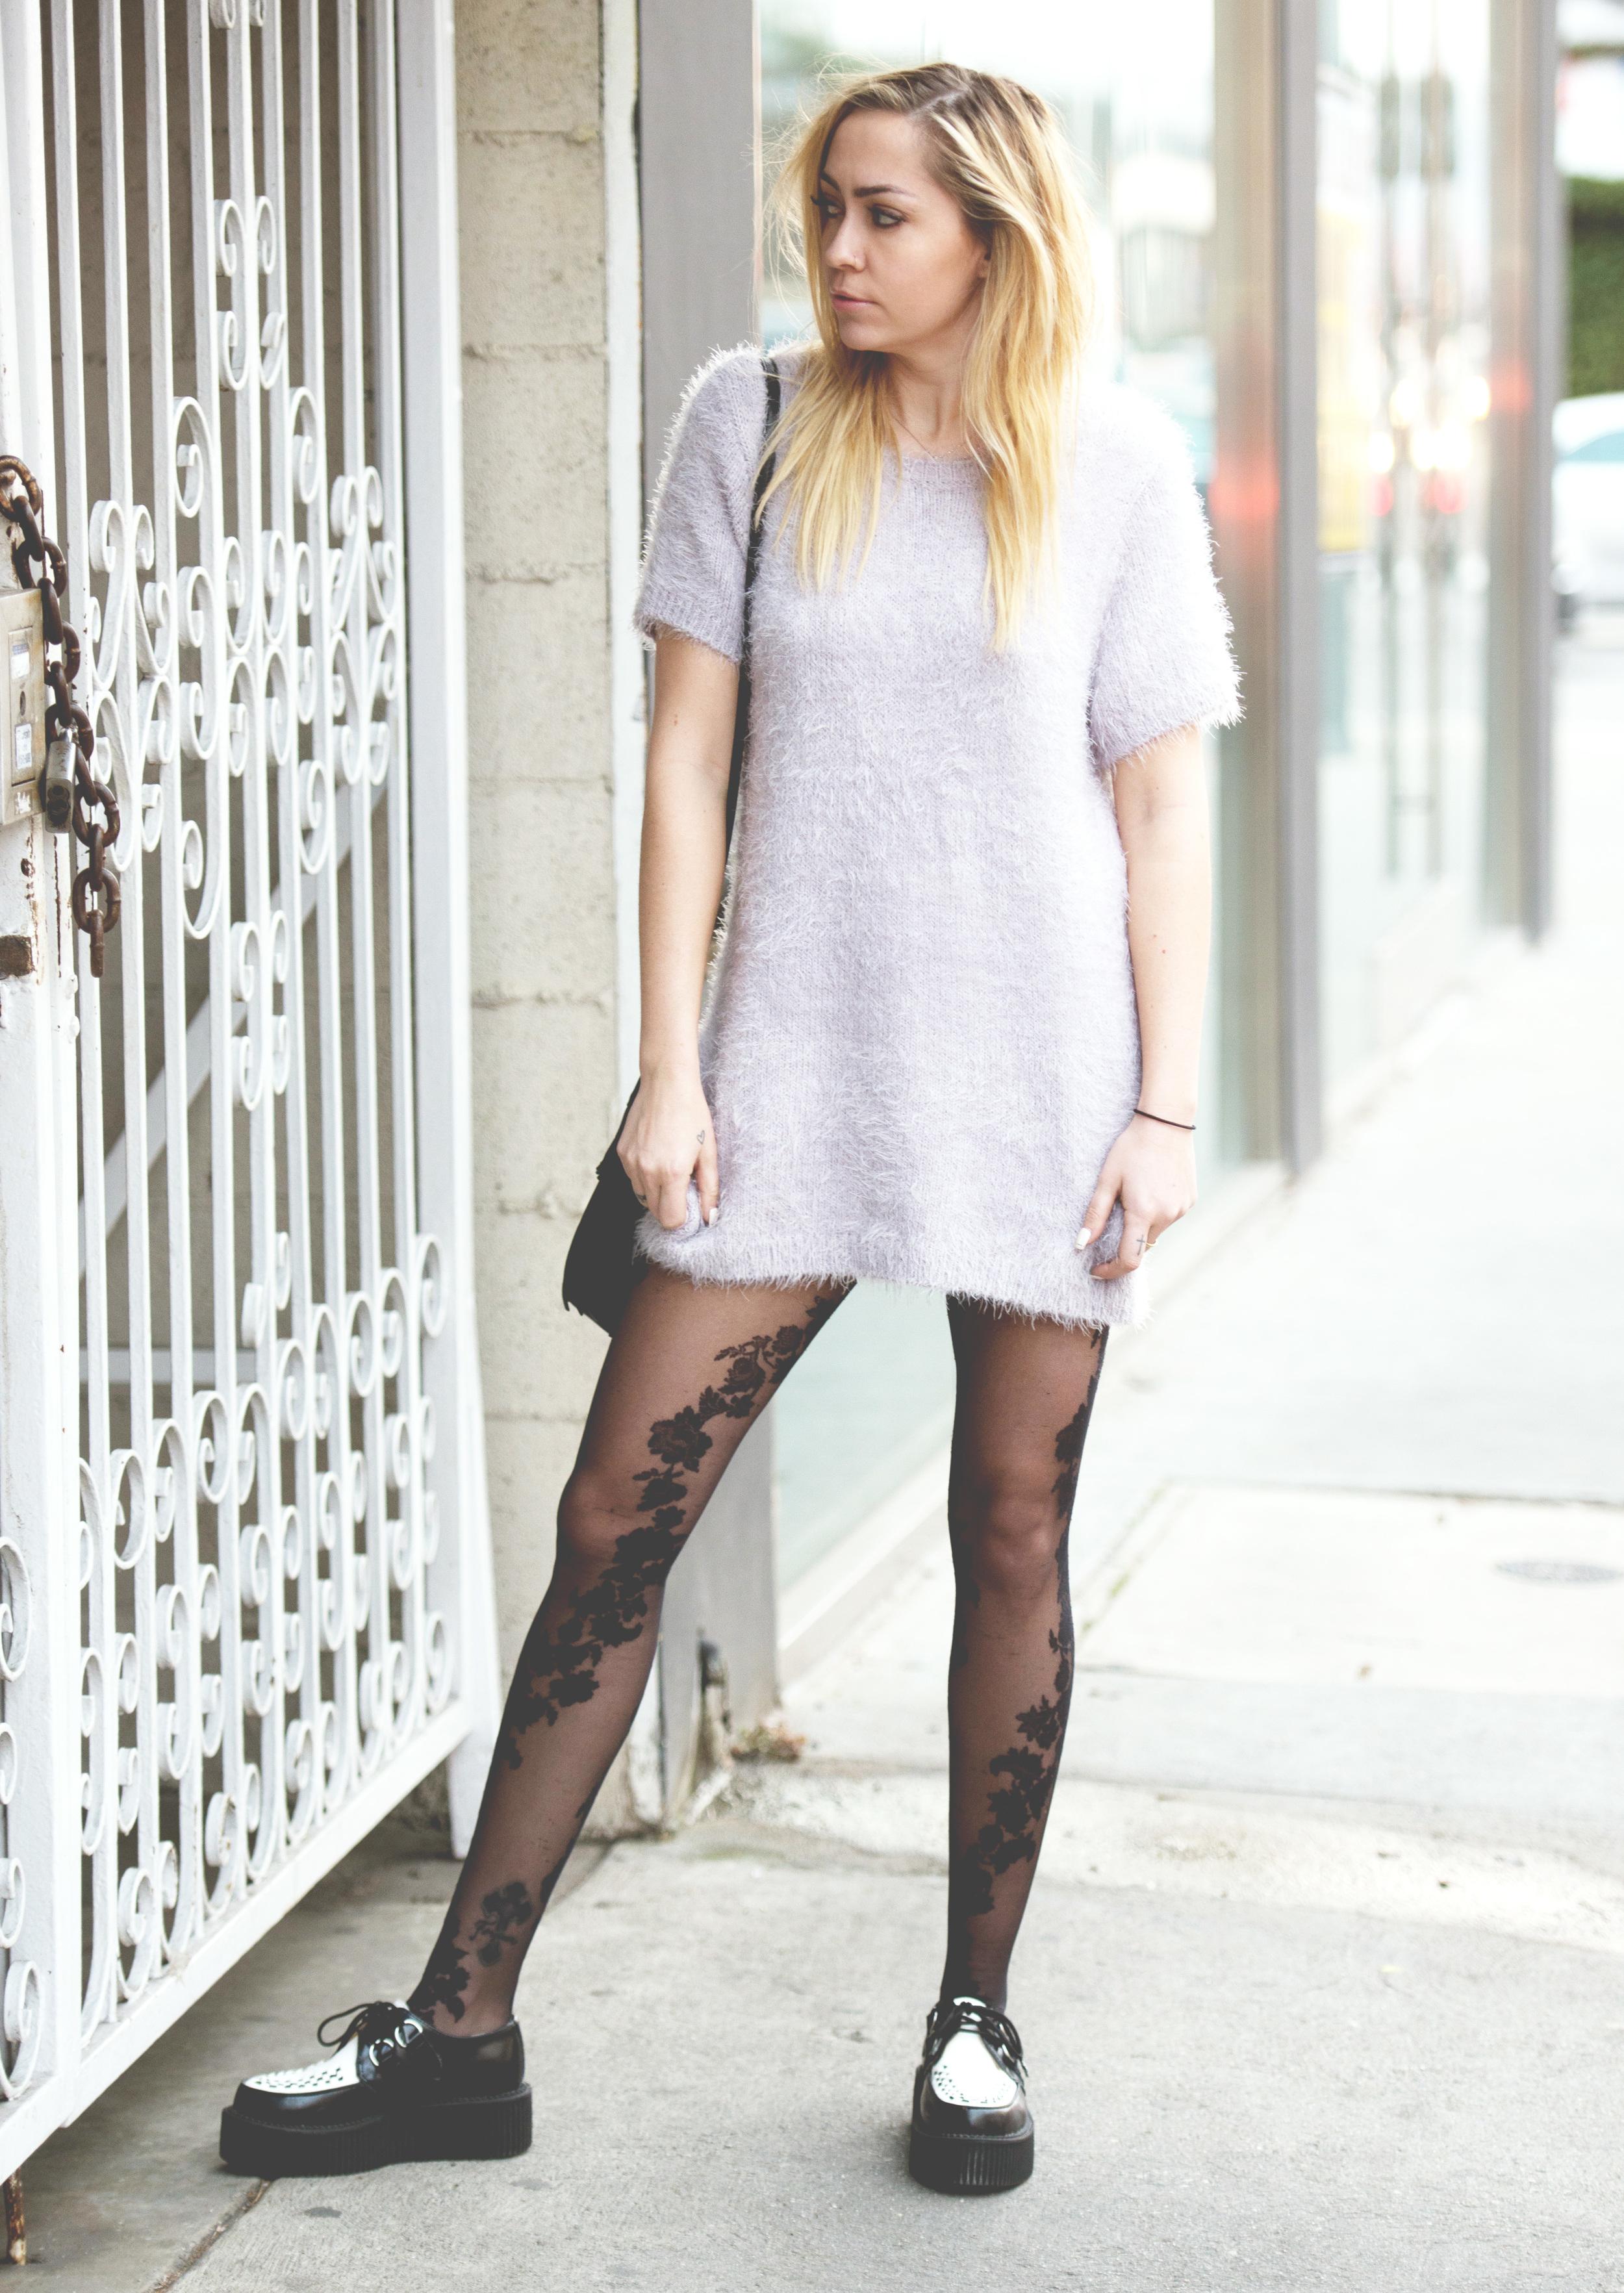 Dress - For Love & Lemons | Tights - |  Shoes - T.U.K.  | Bag - Gerard Darrel || photos by  Piper Rastello